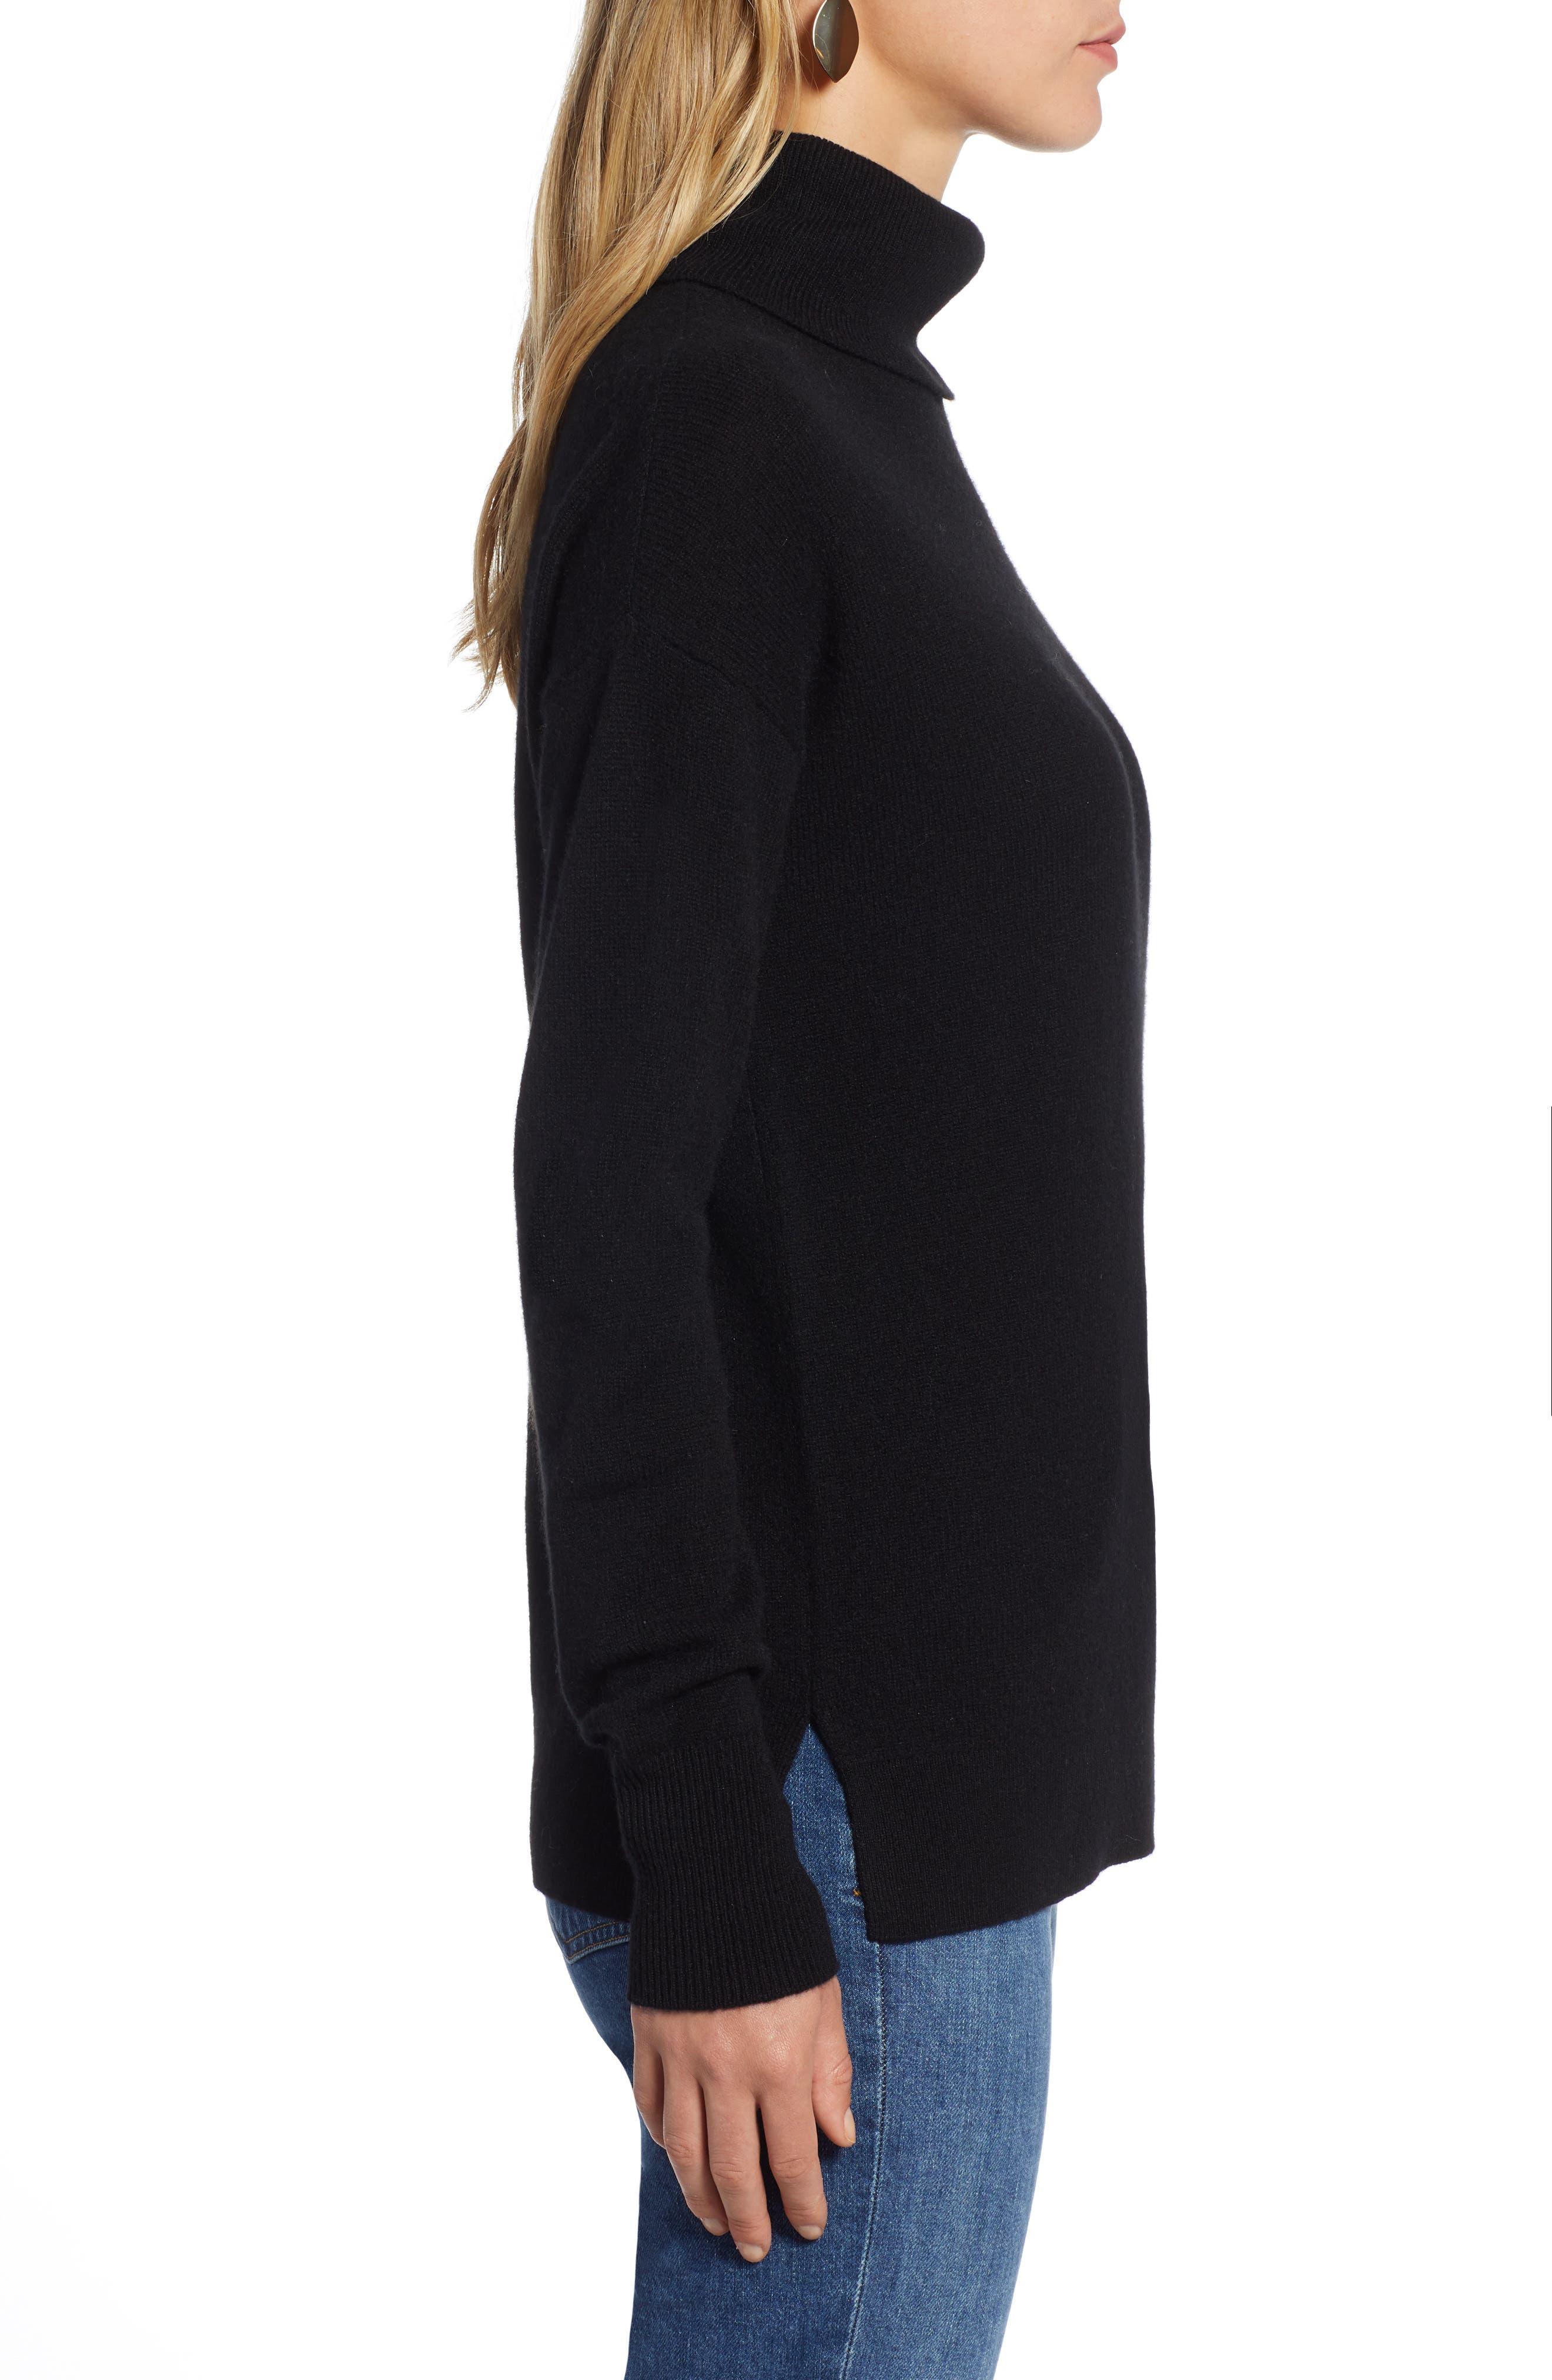 HALOGEN<SUP>®</SUP>, Cashmere Turtleneck Sweater, Alternate thumbnail 3, color, 001